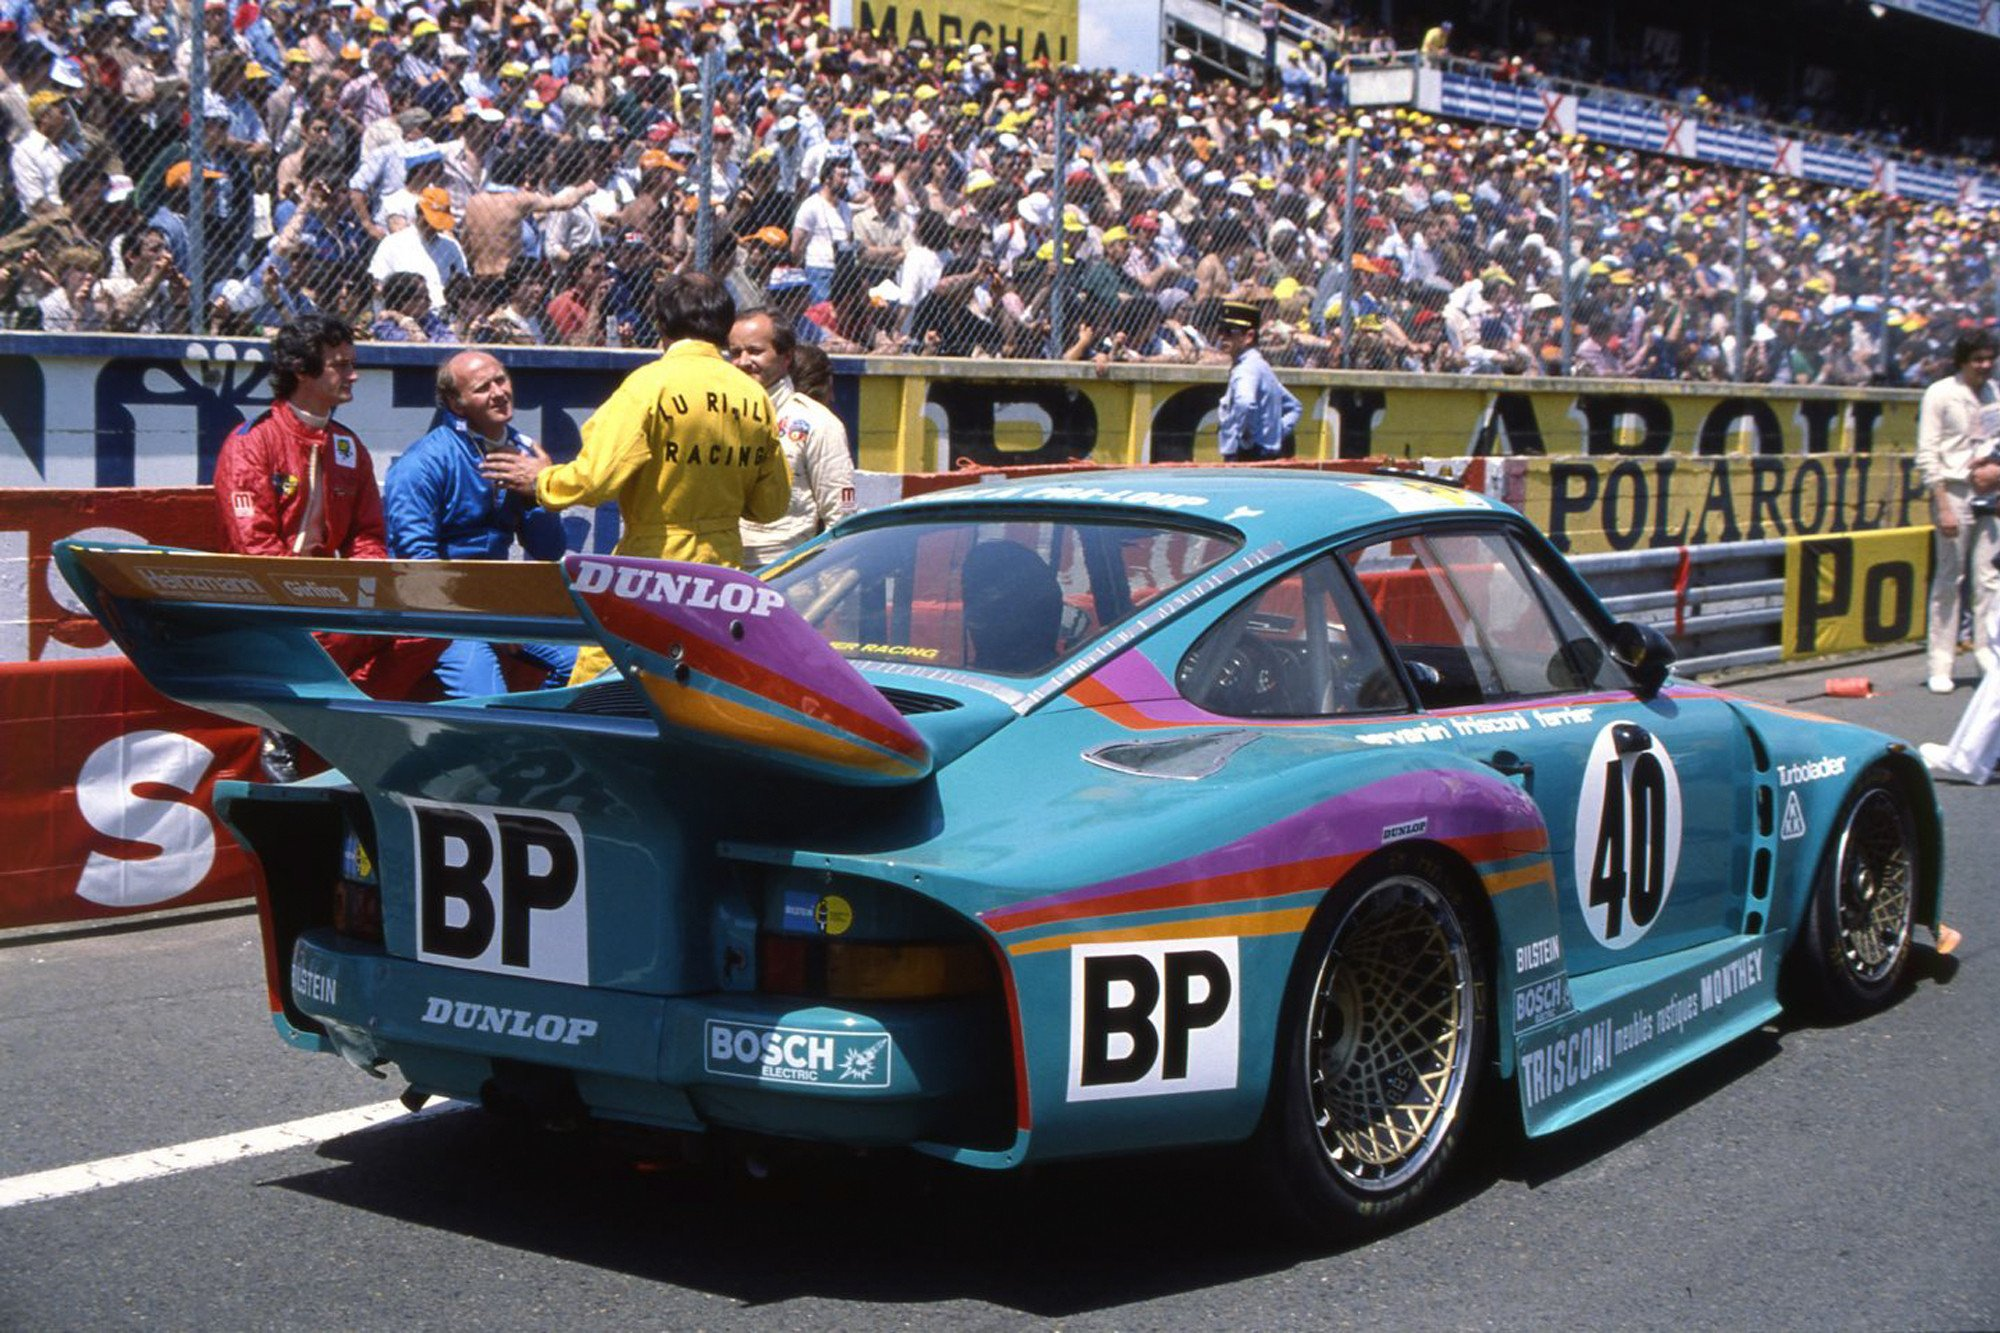 Laurent Ferrier Le Mans 1979 Porsche Kramer